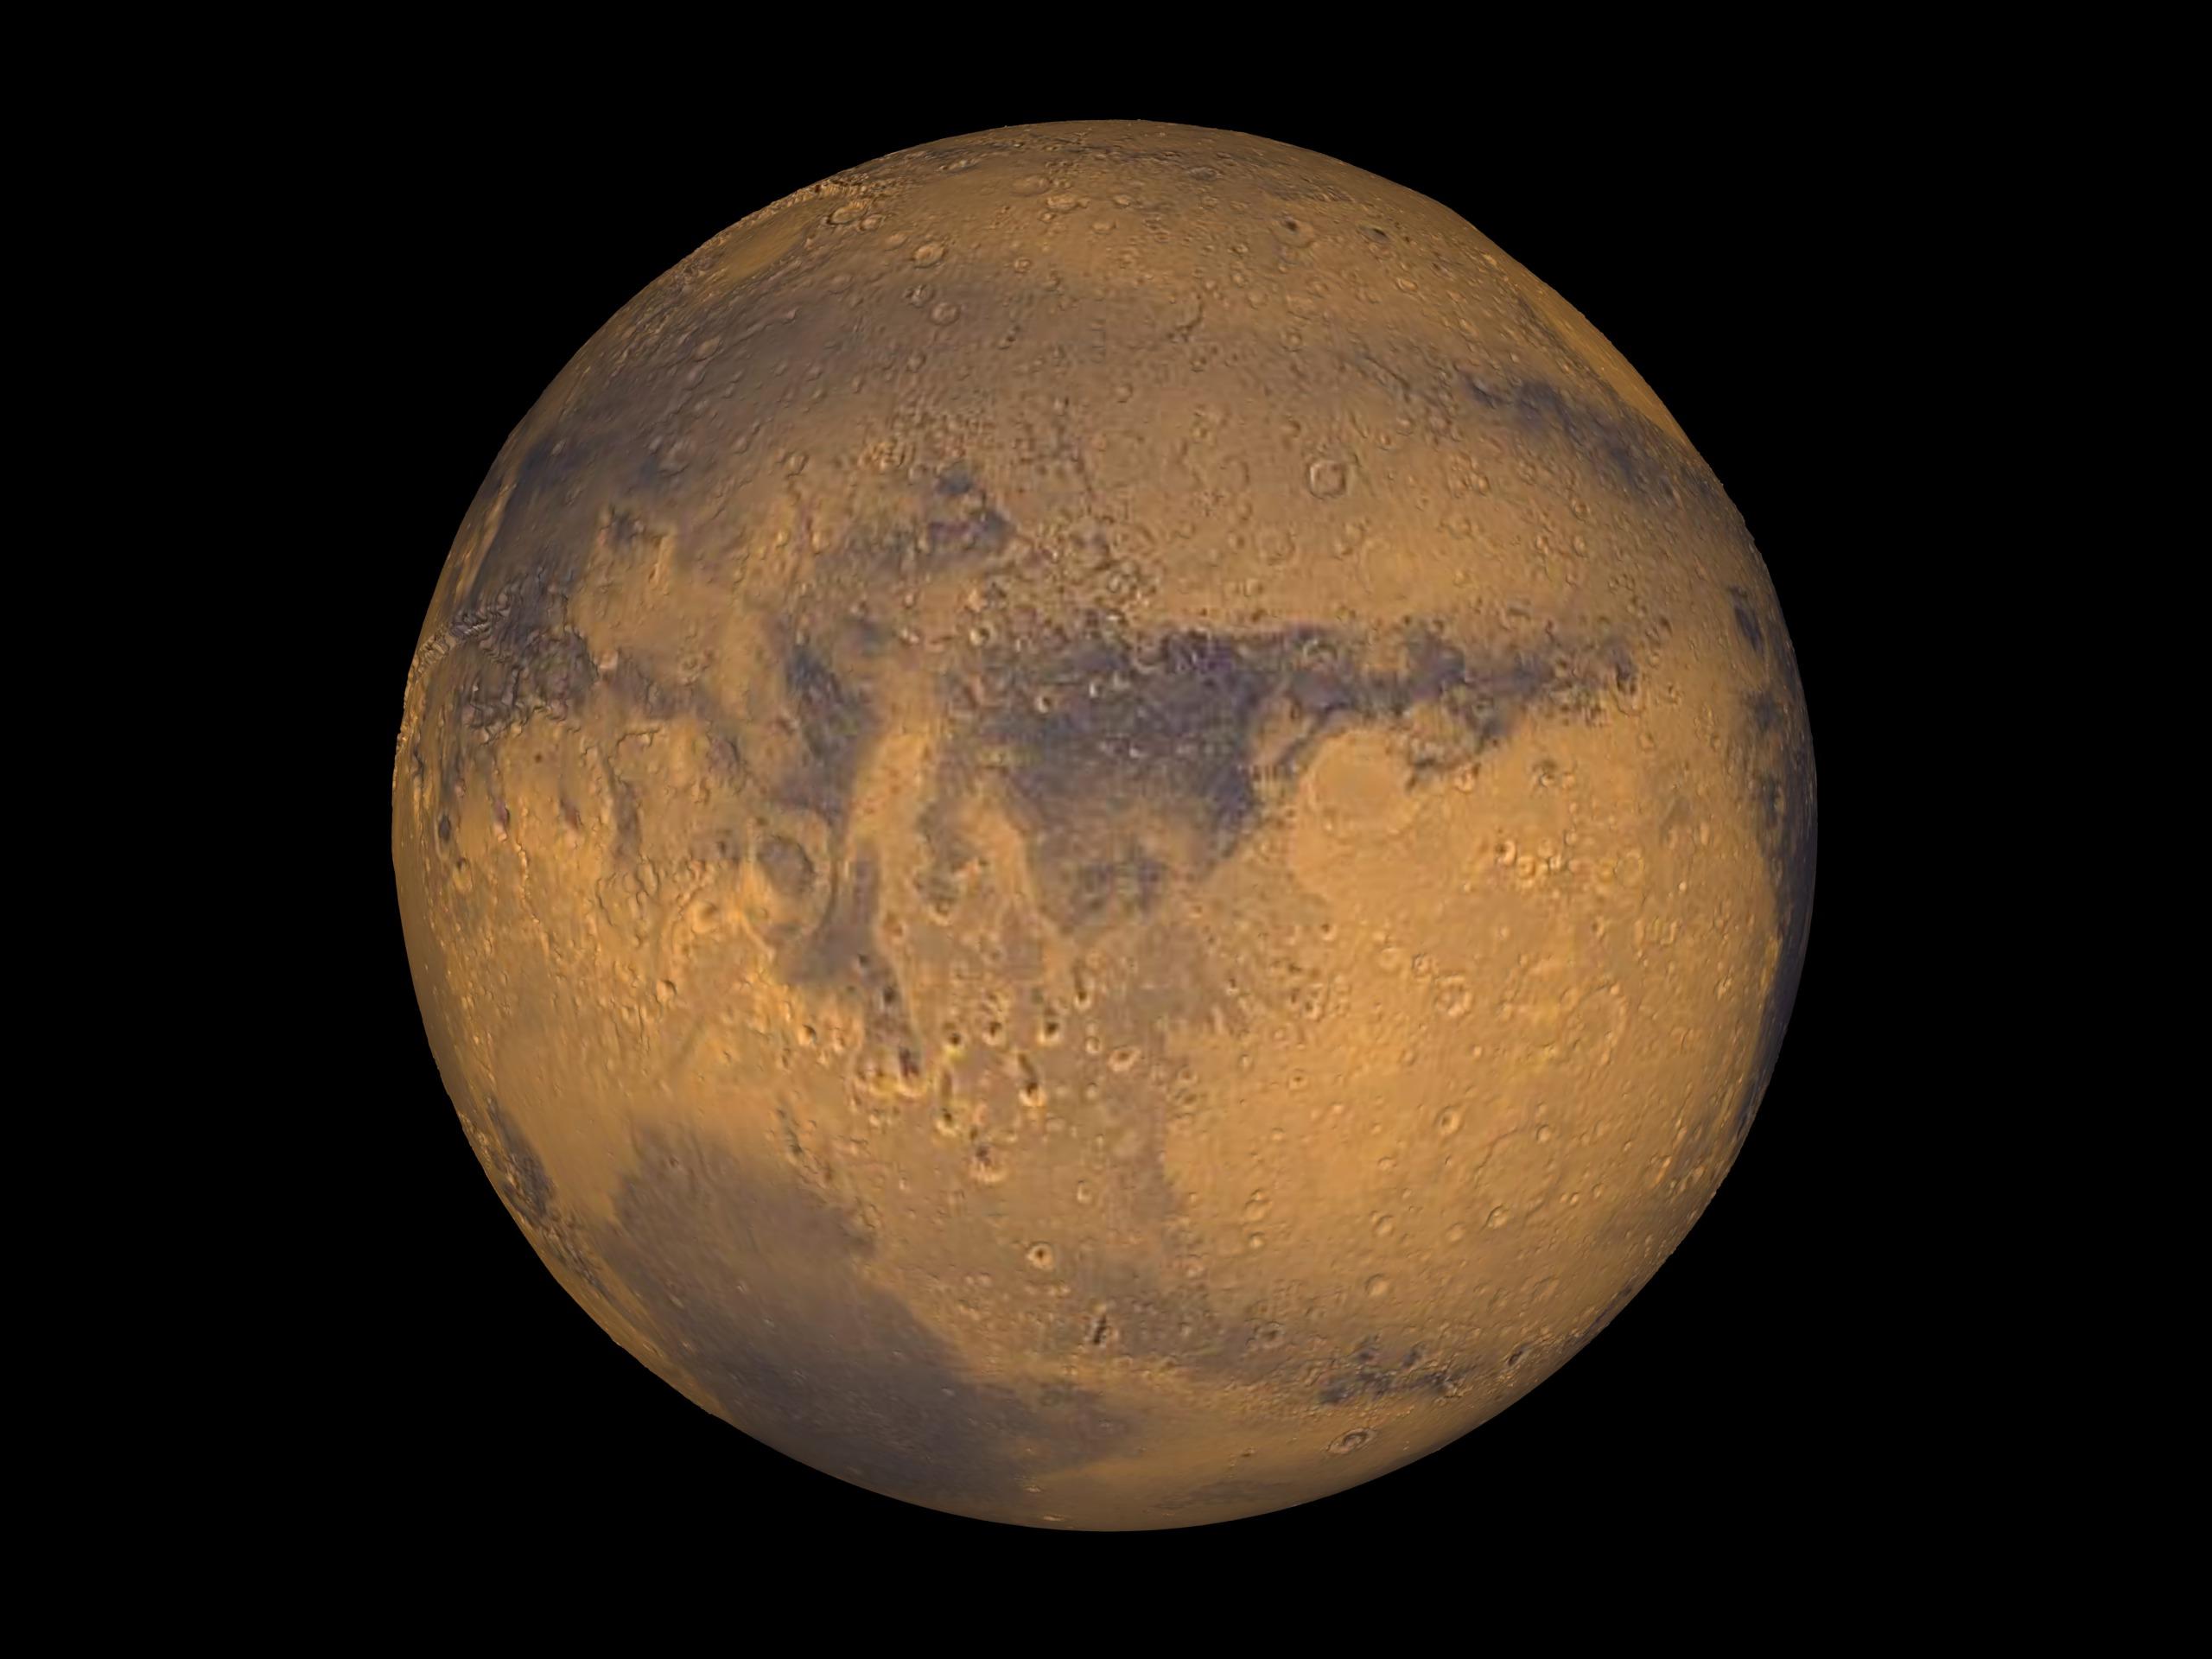 Human Landing Sites/Exploration Zones on Mars Workshop Oct. 27-30 ...